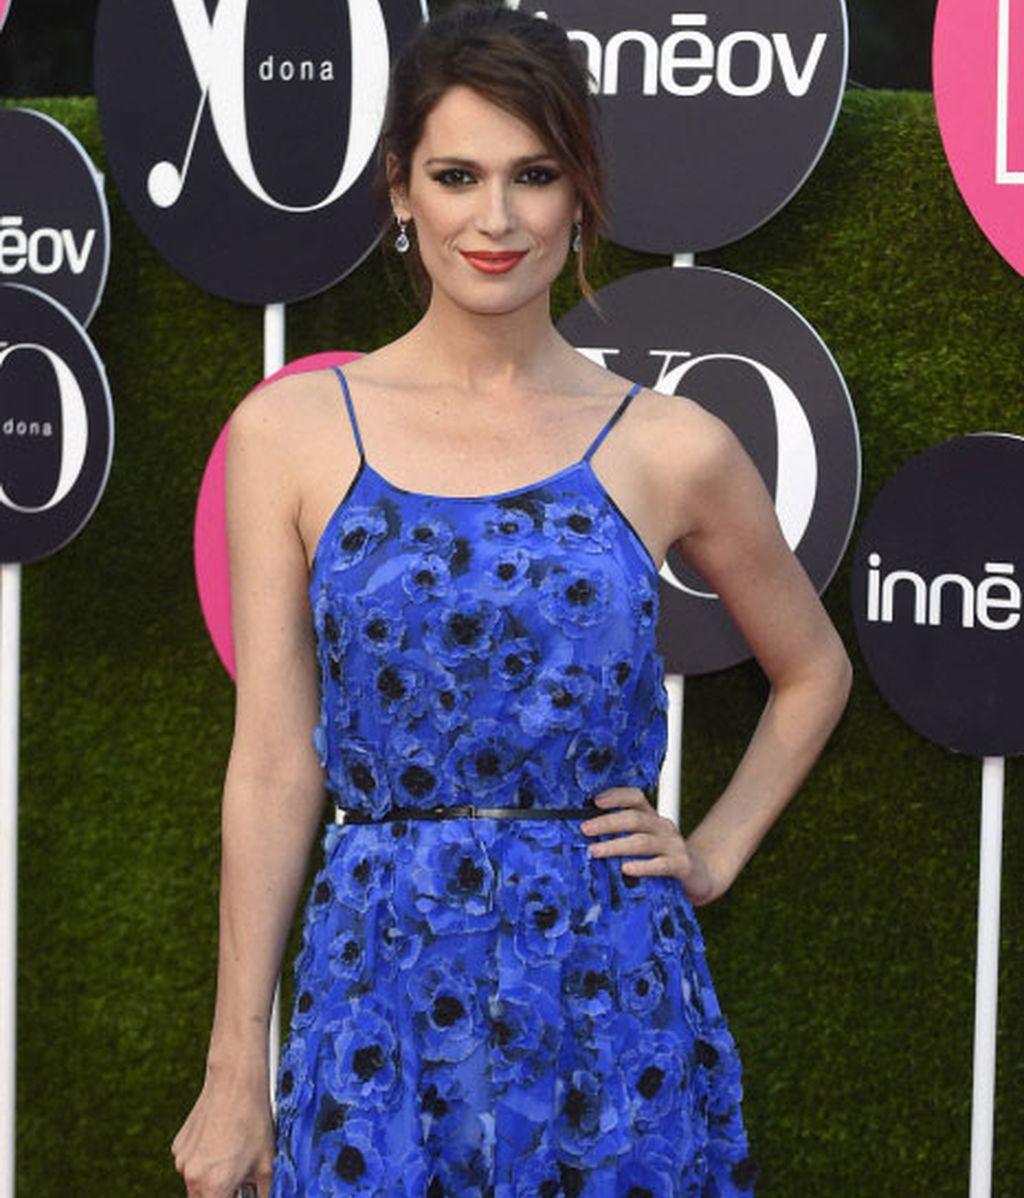 La floresno podían faltar en el vestido azul que lució Mar Flores